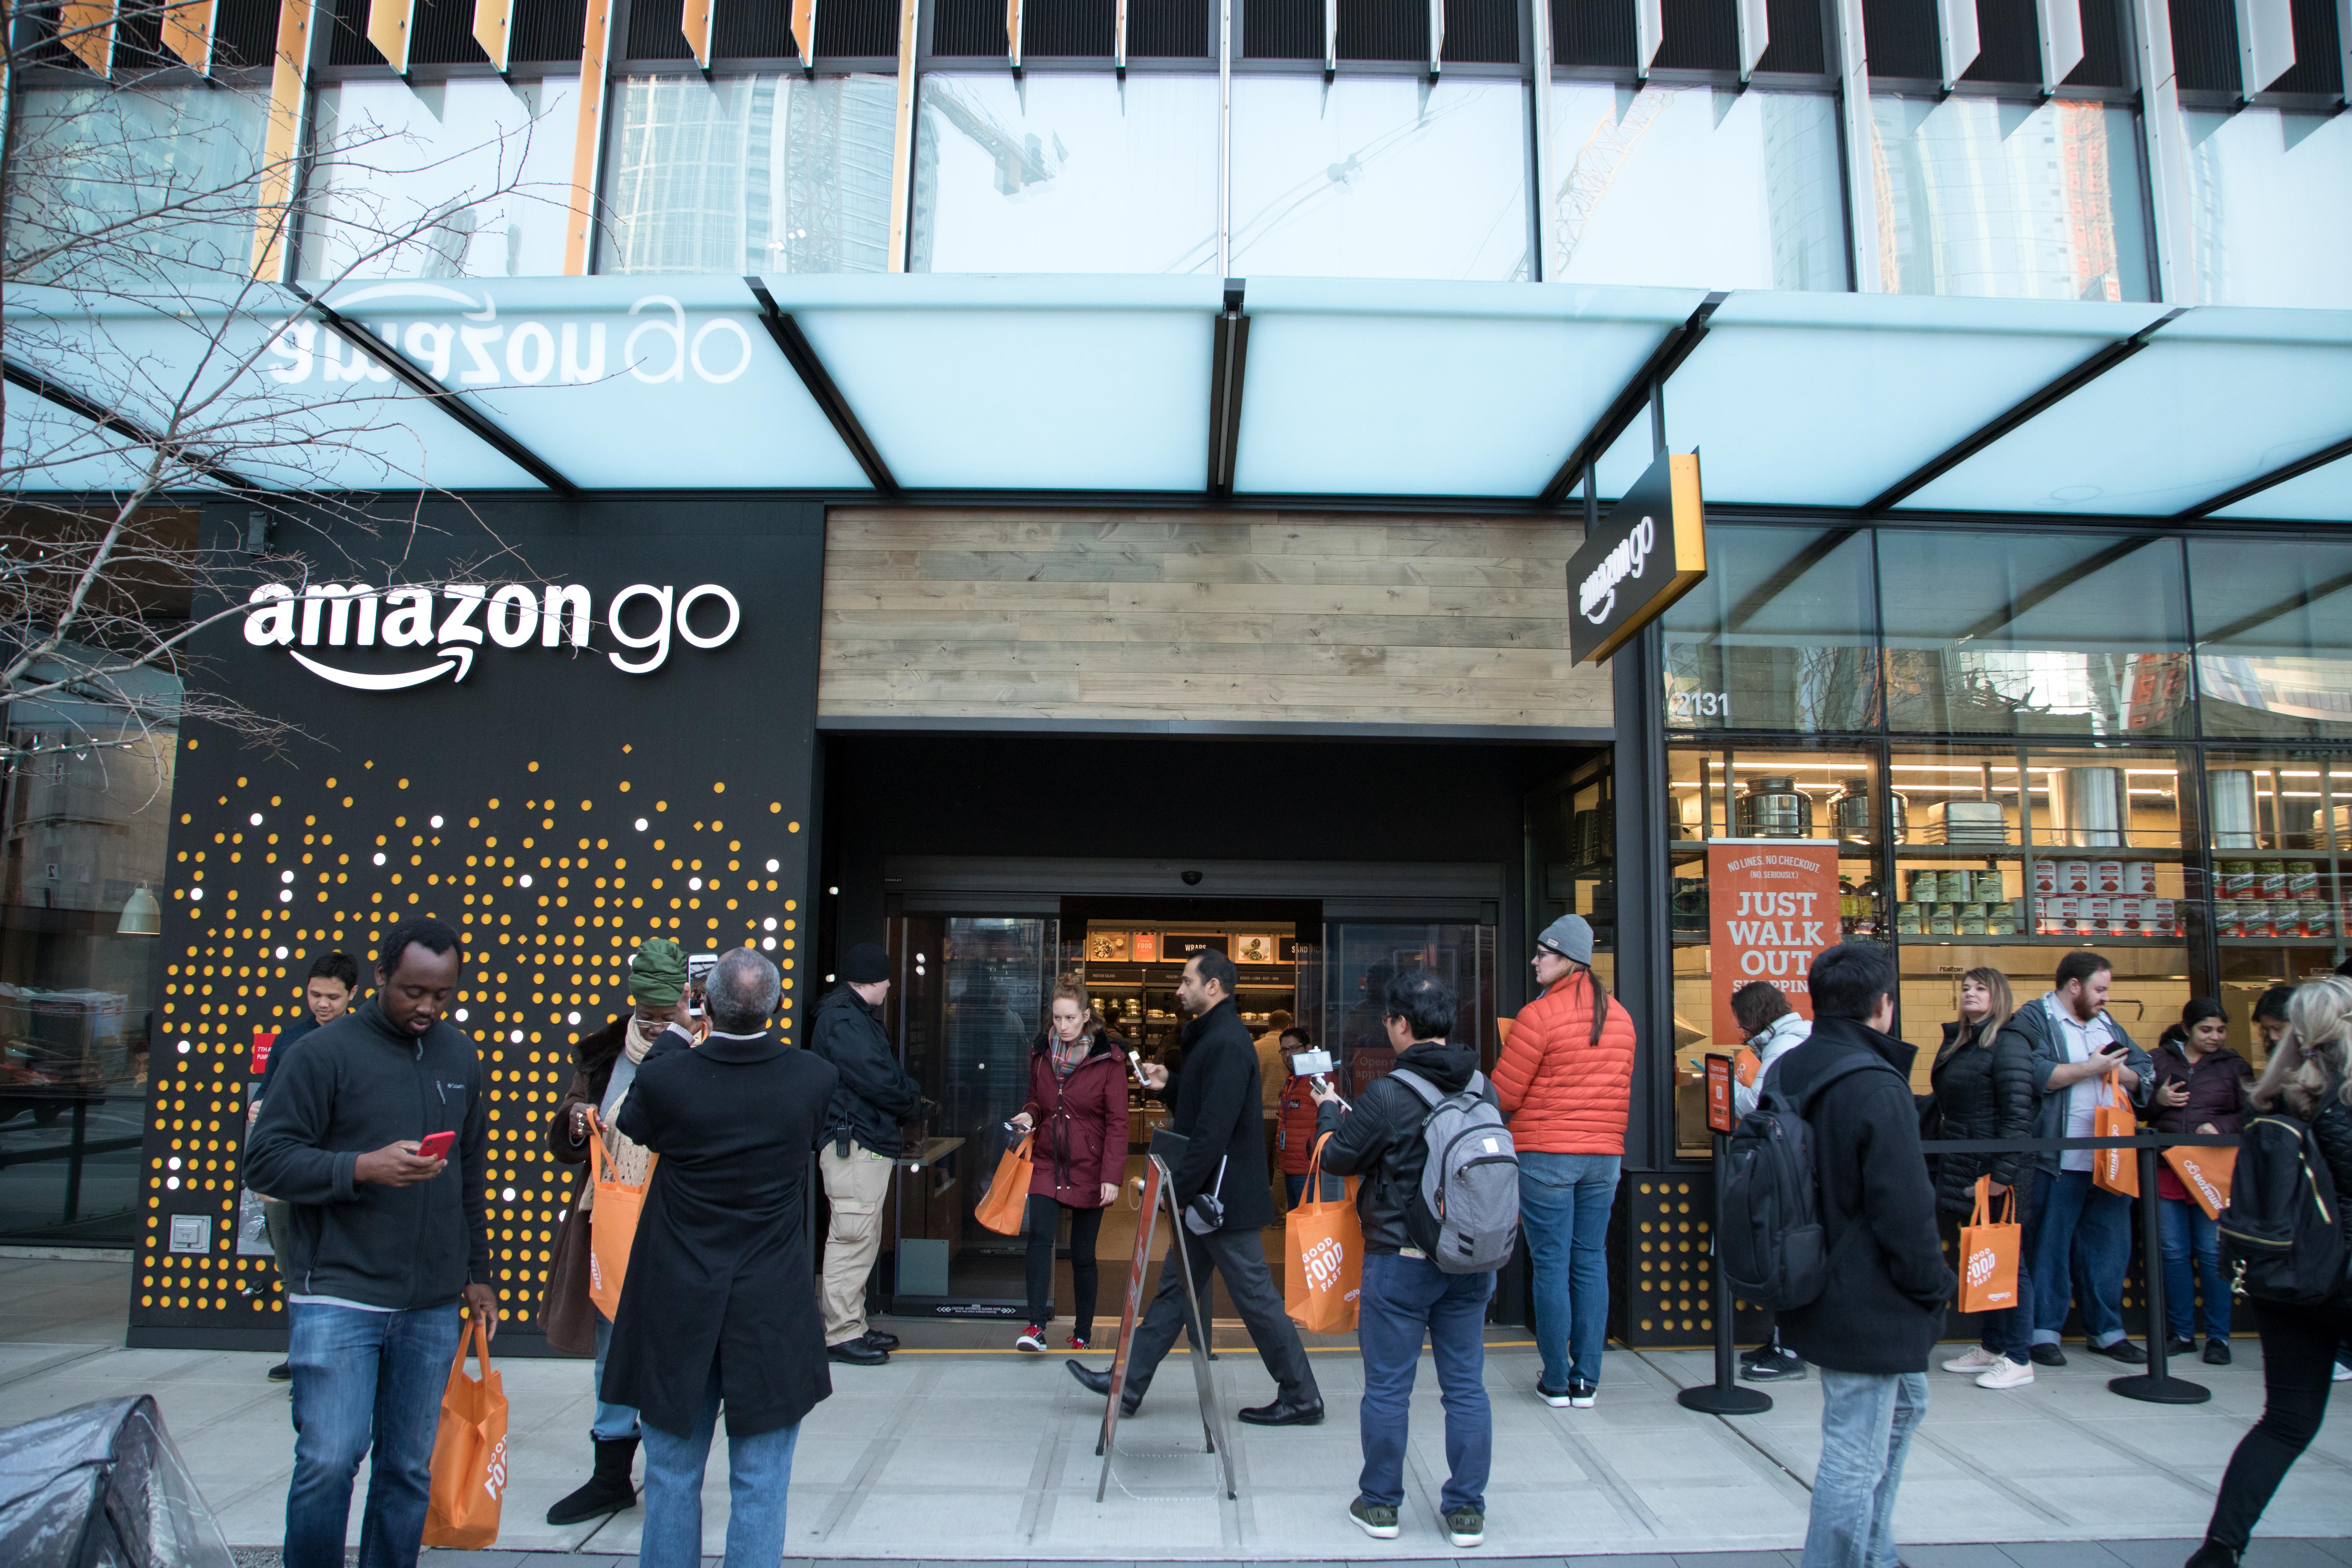 Five economic development takeaways from the Amazon HQ2 bids